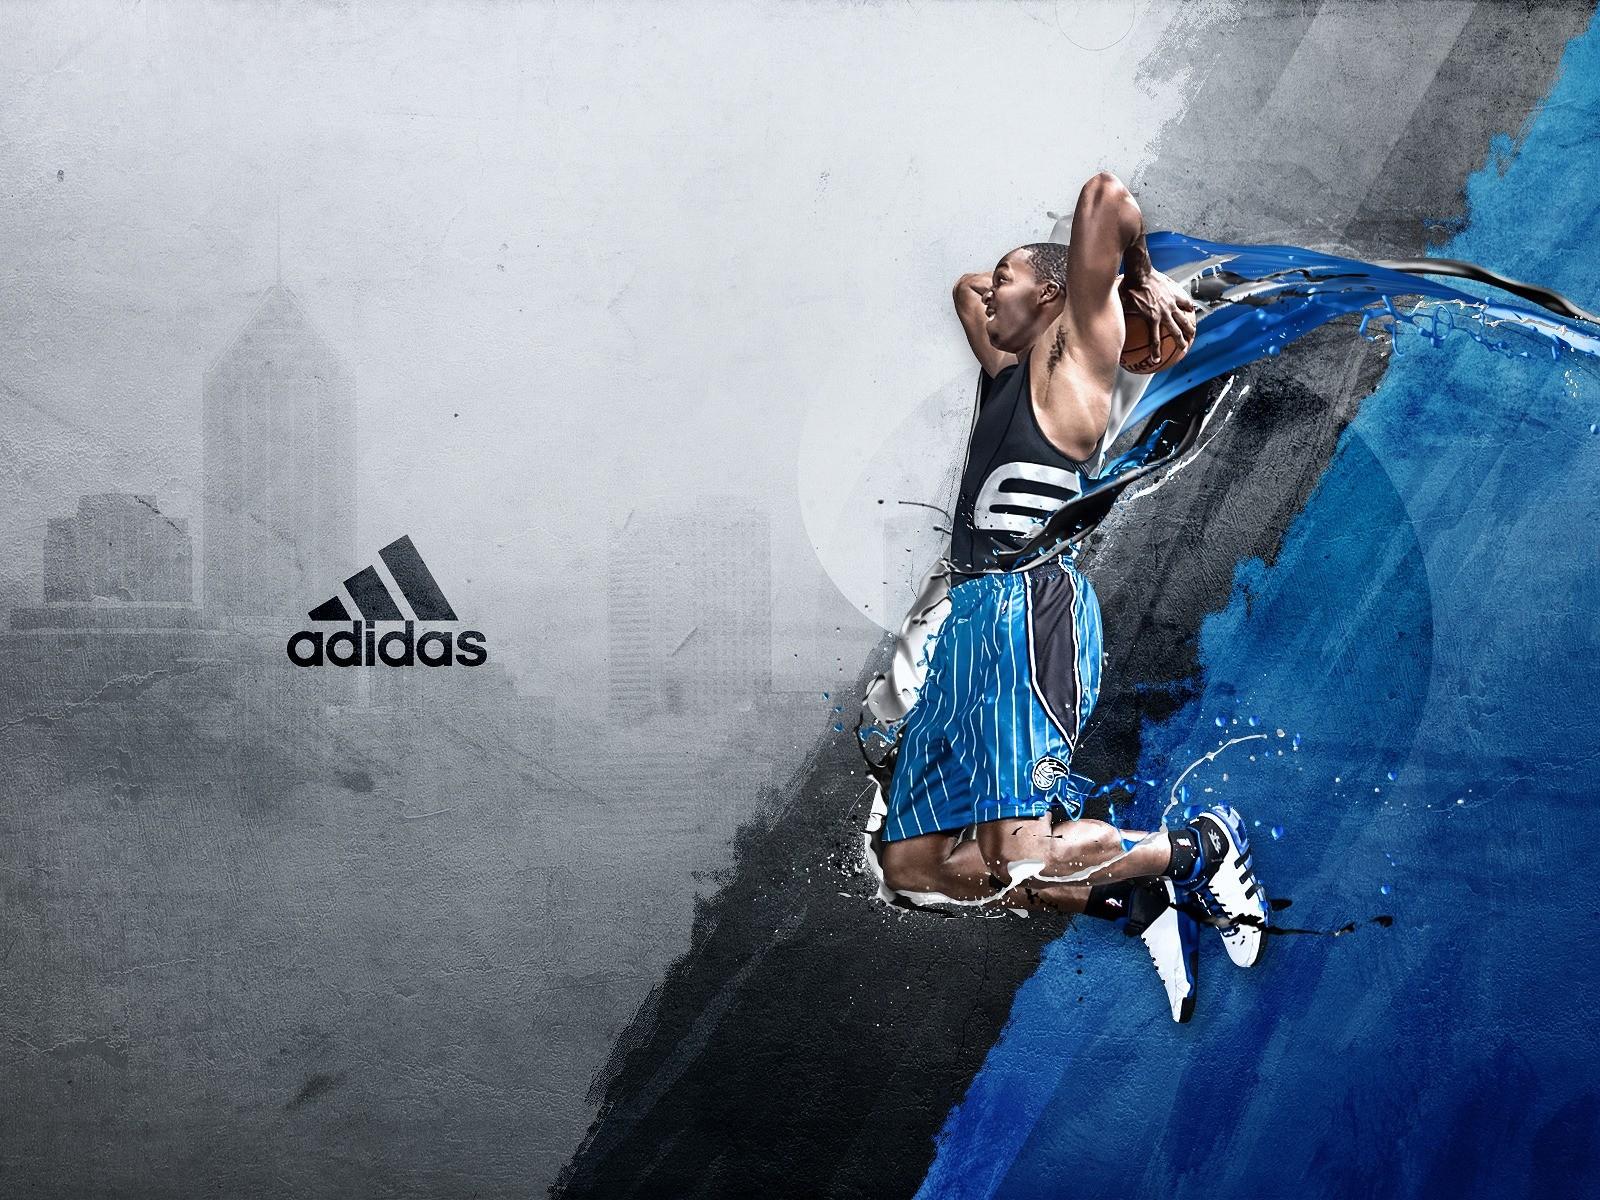 Basketball Wallpapers HD Best Wallpapers HD 1600x1200